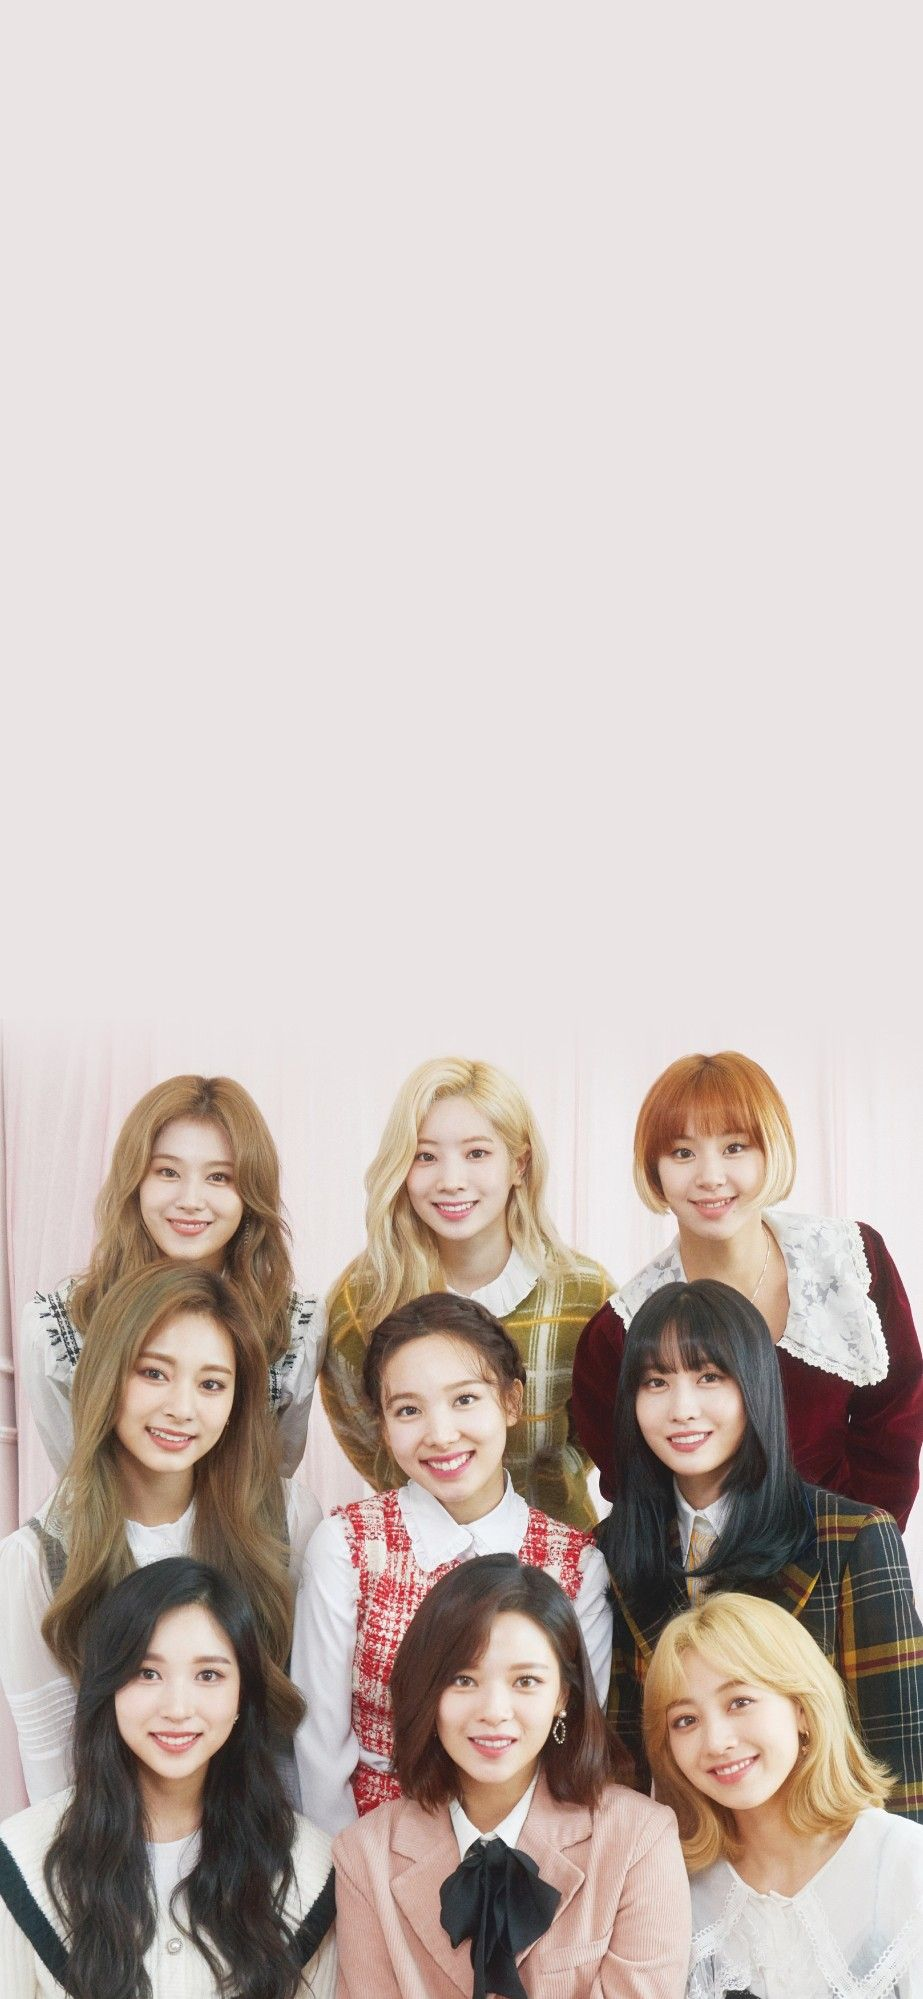 Twice Wallpaper Dicon Magazine Dispatch Twice Photoshoot Kpop Girl Groups Kpop Girls